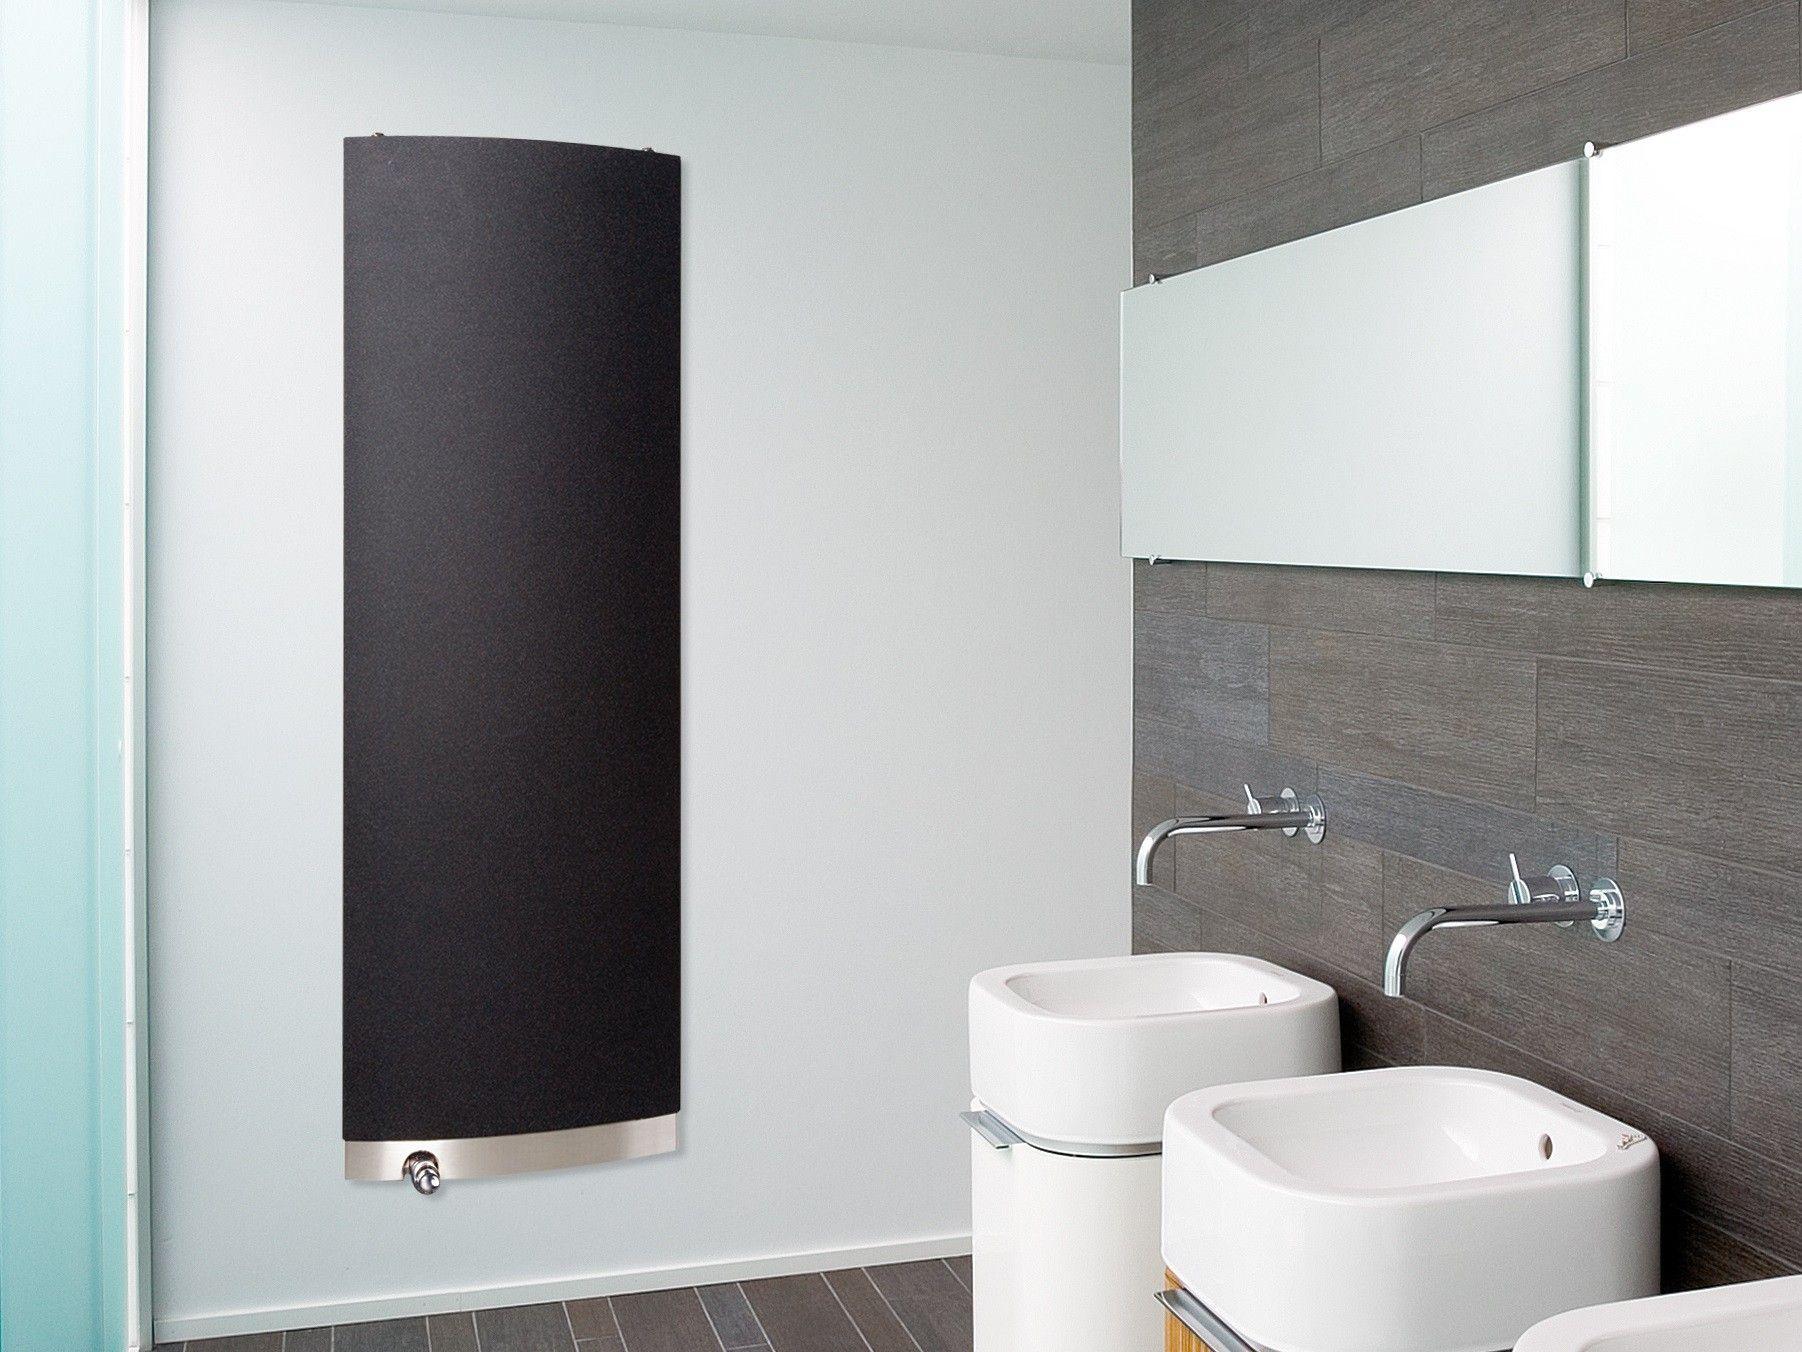 Vertikal 1600mm Design Heizkörper Vertikal Wohnzimmer